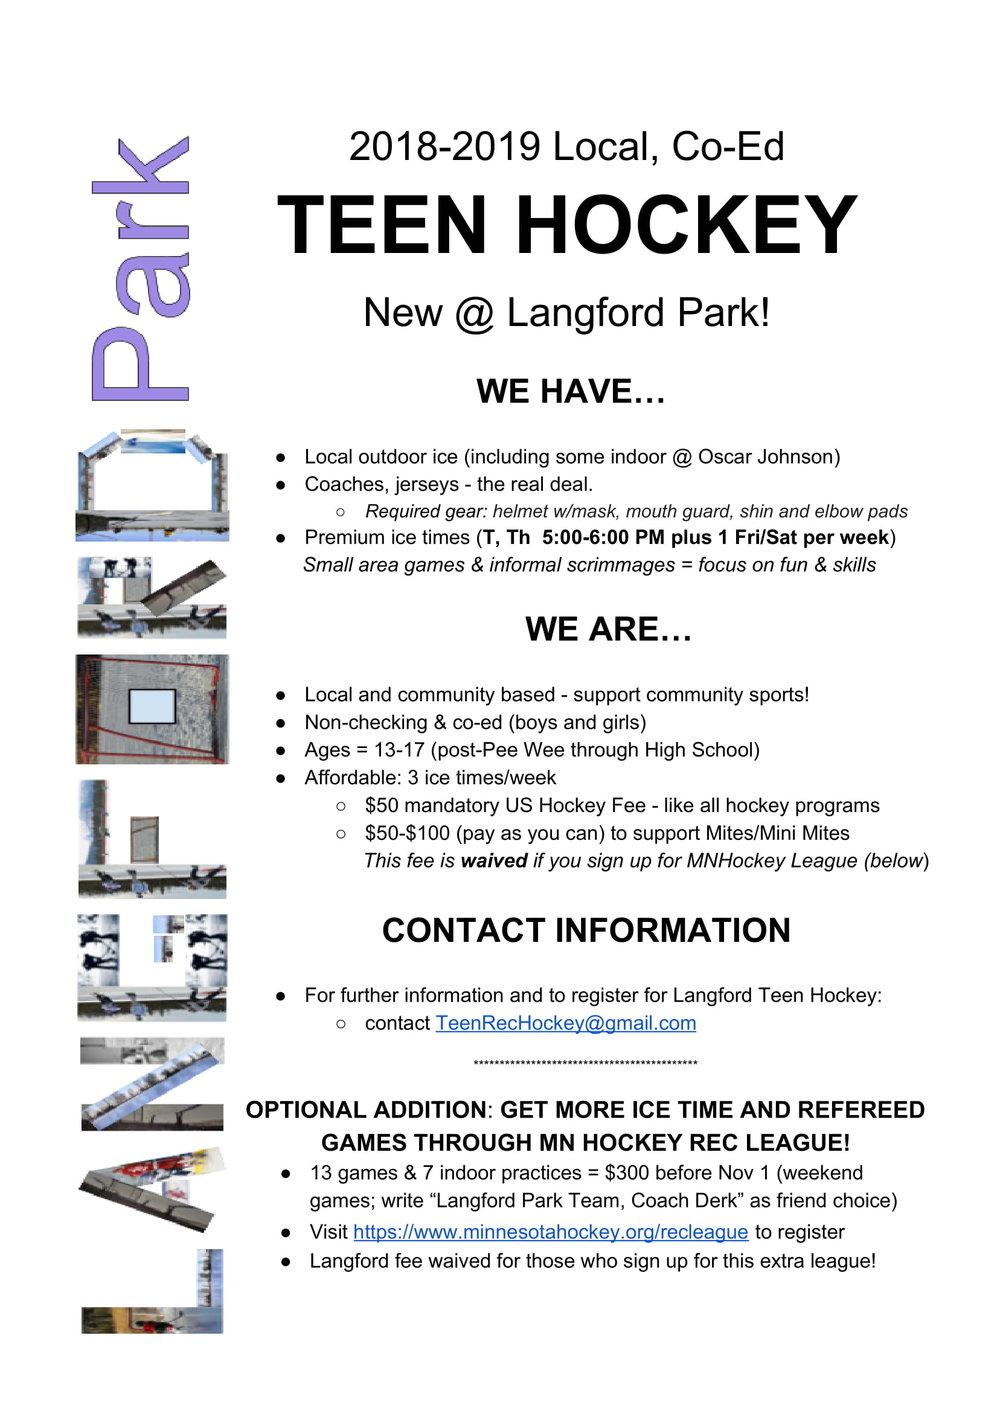 FINAL Langford Teen Hockey Flyer-1.jpg